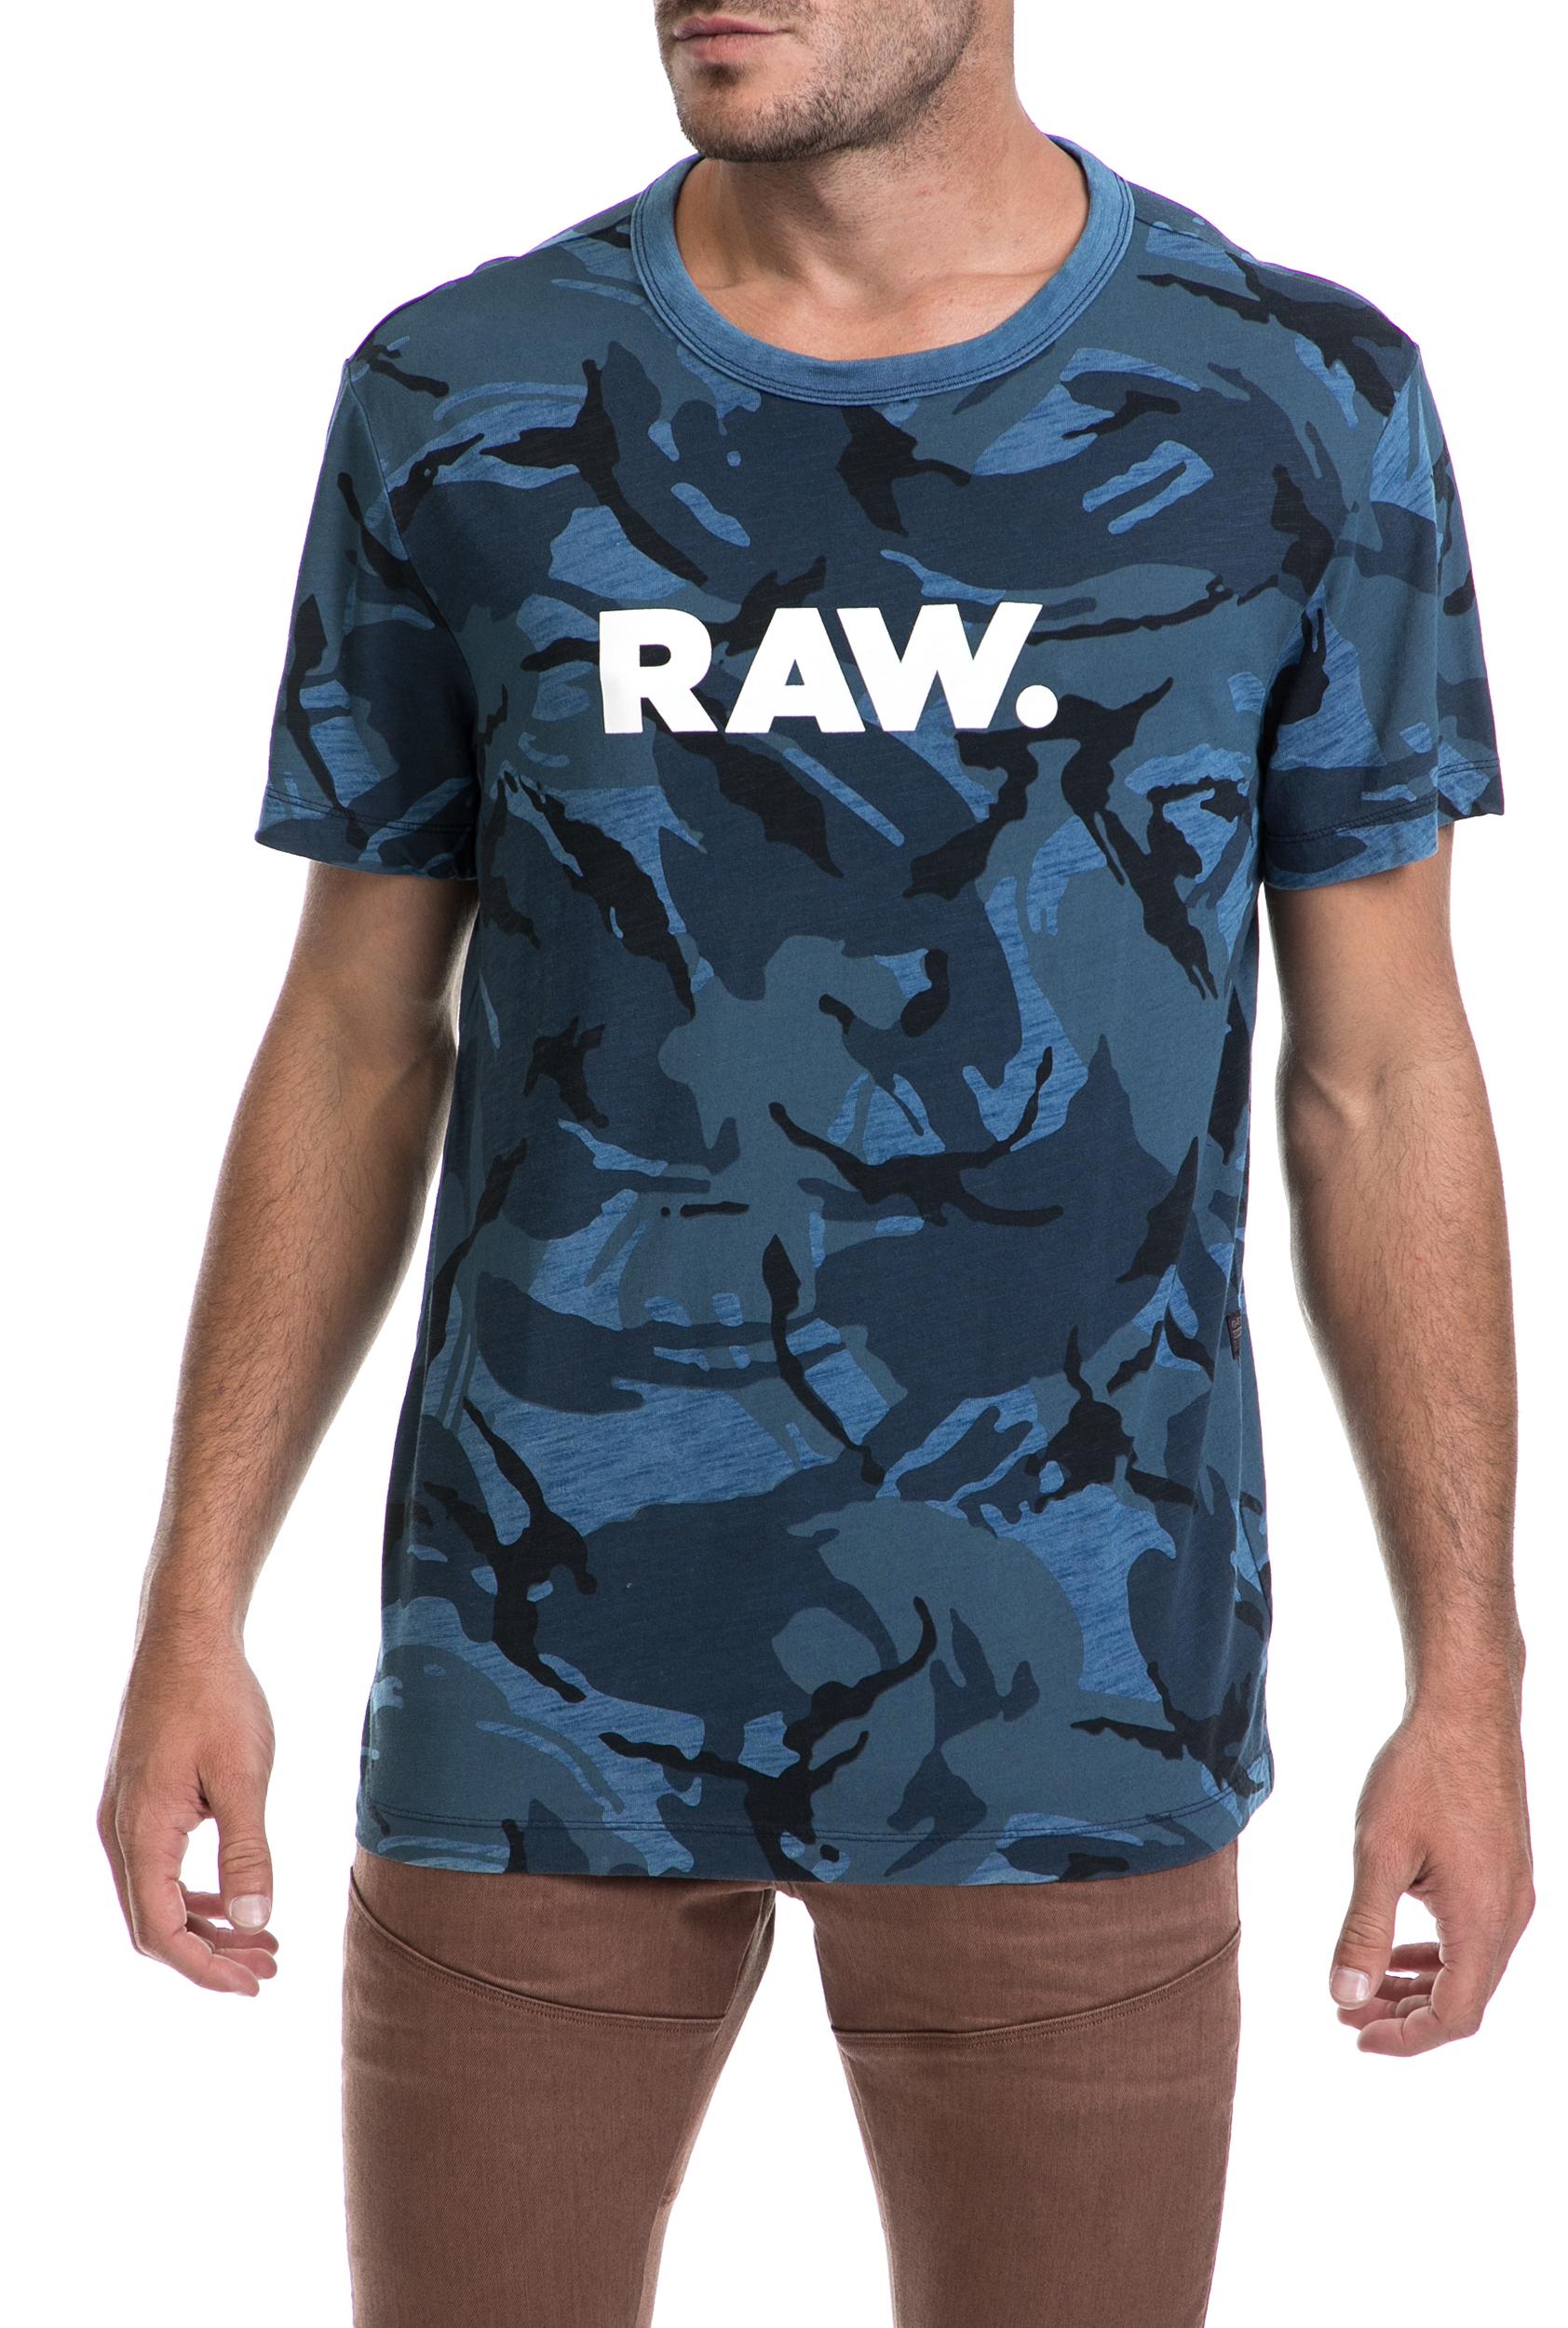 G-STAR - Ανδρικό t-shirt G-STAR RAW μπλε ανδρικά ρούχα μπλούζες κοντομάνικες